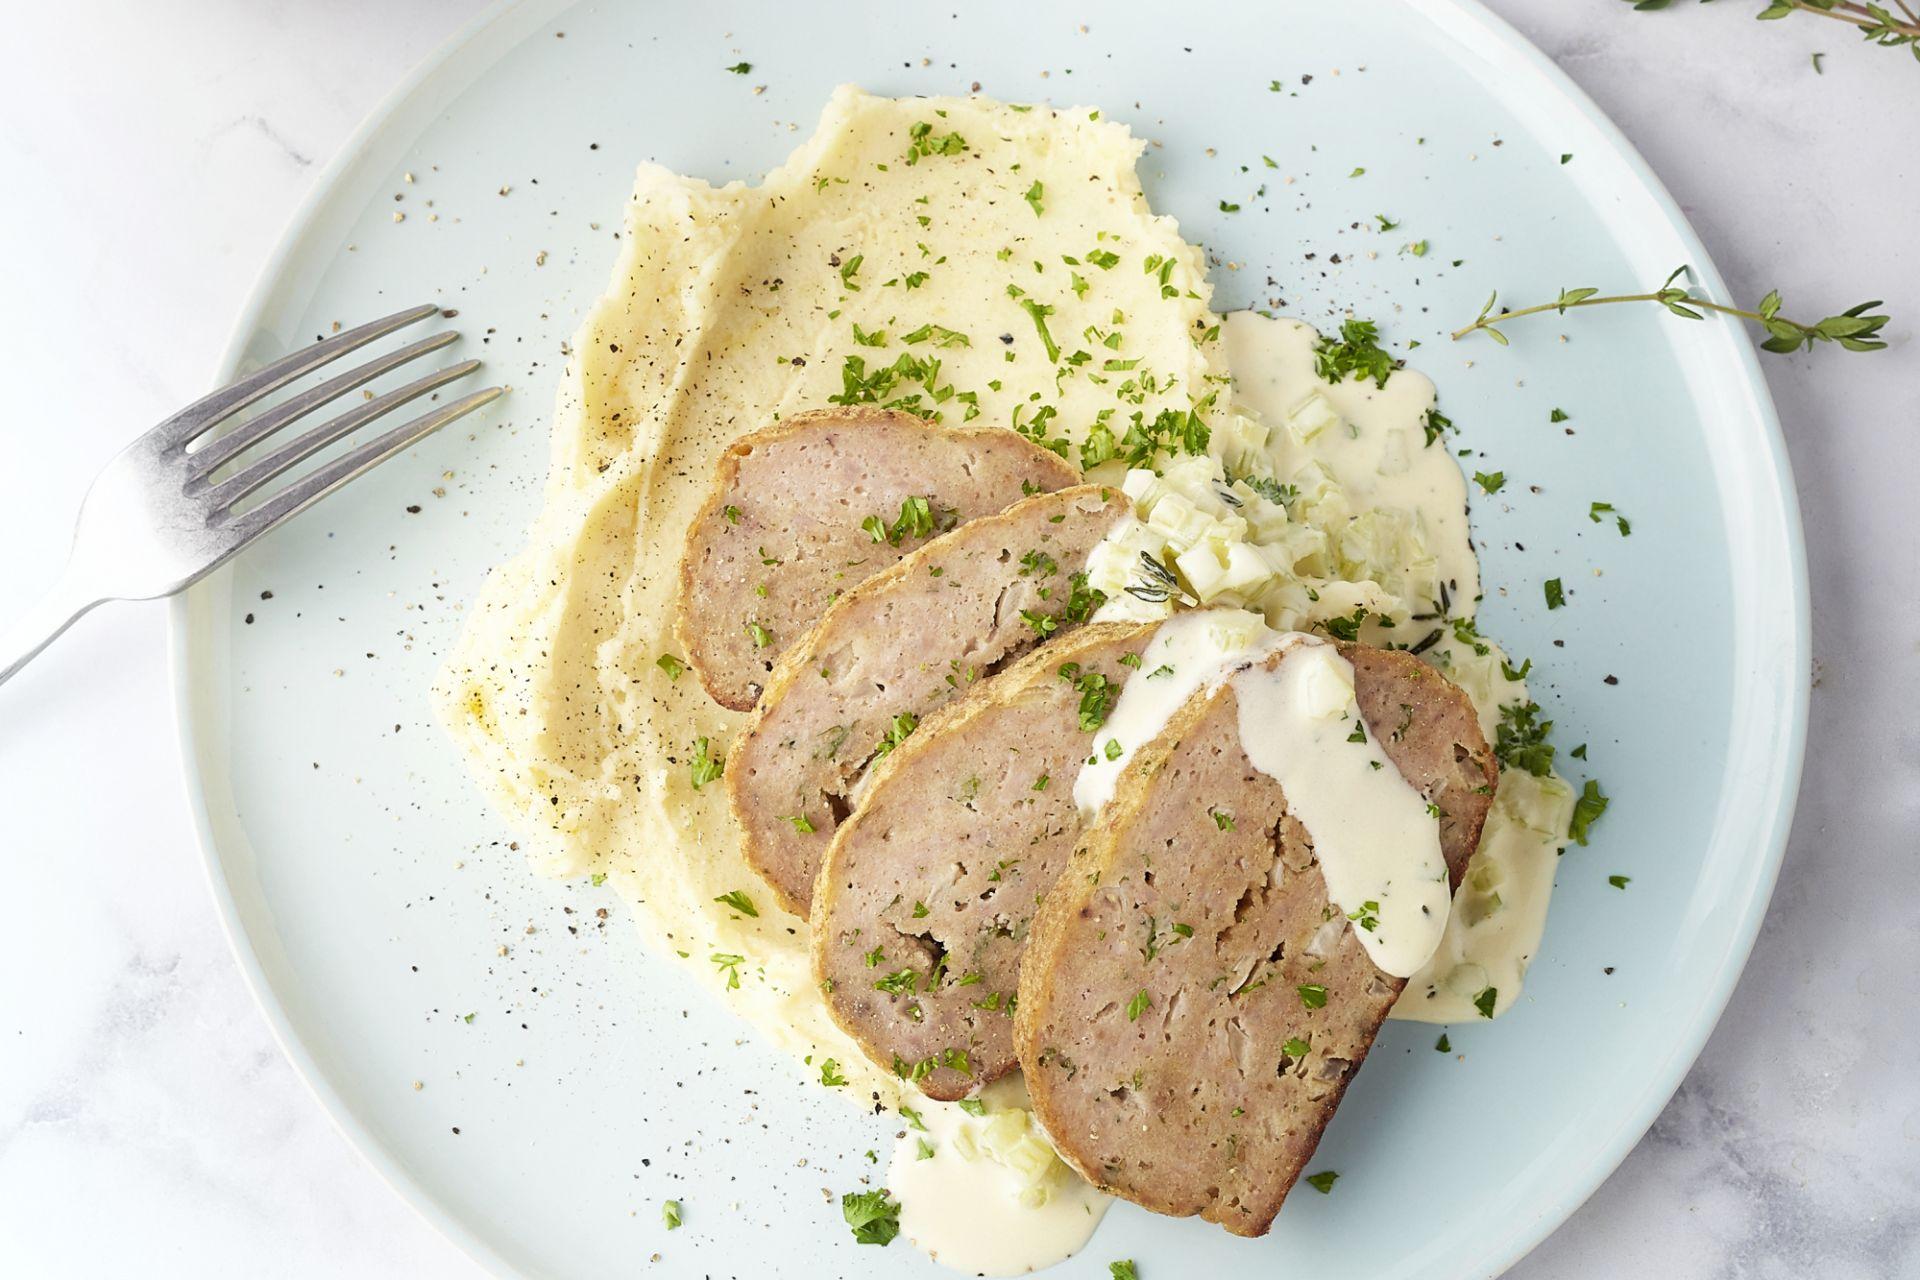 Gehaktbroodje met seldersaus en aardappelpuree